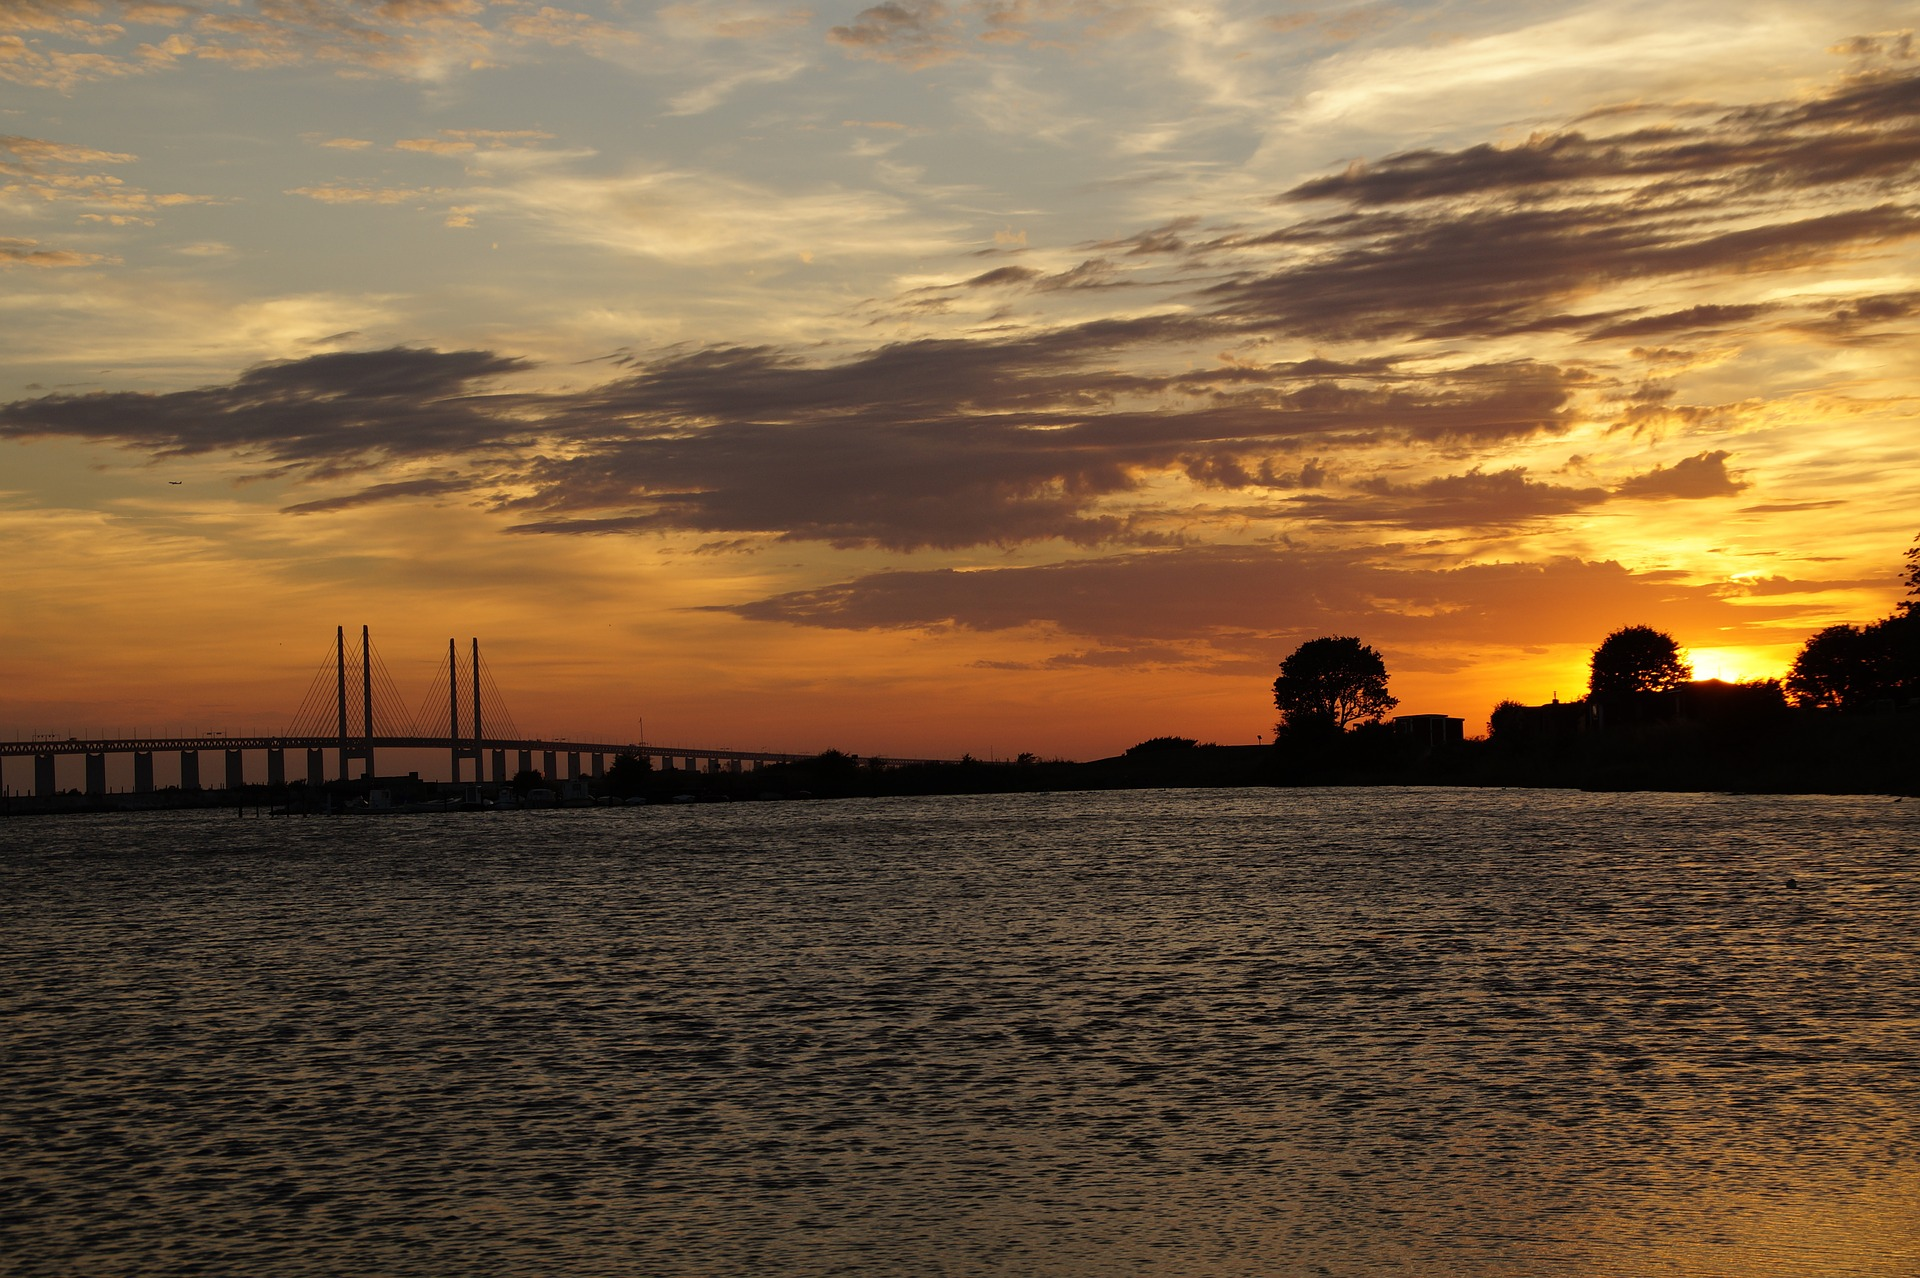 sunset-920299_1920